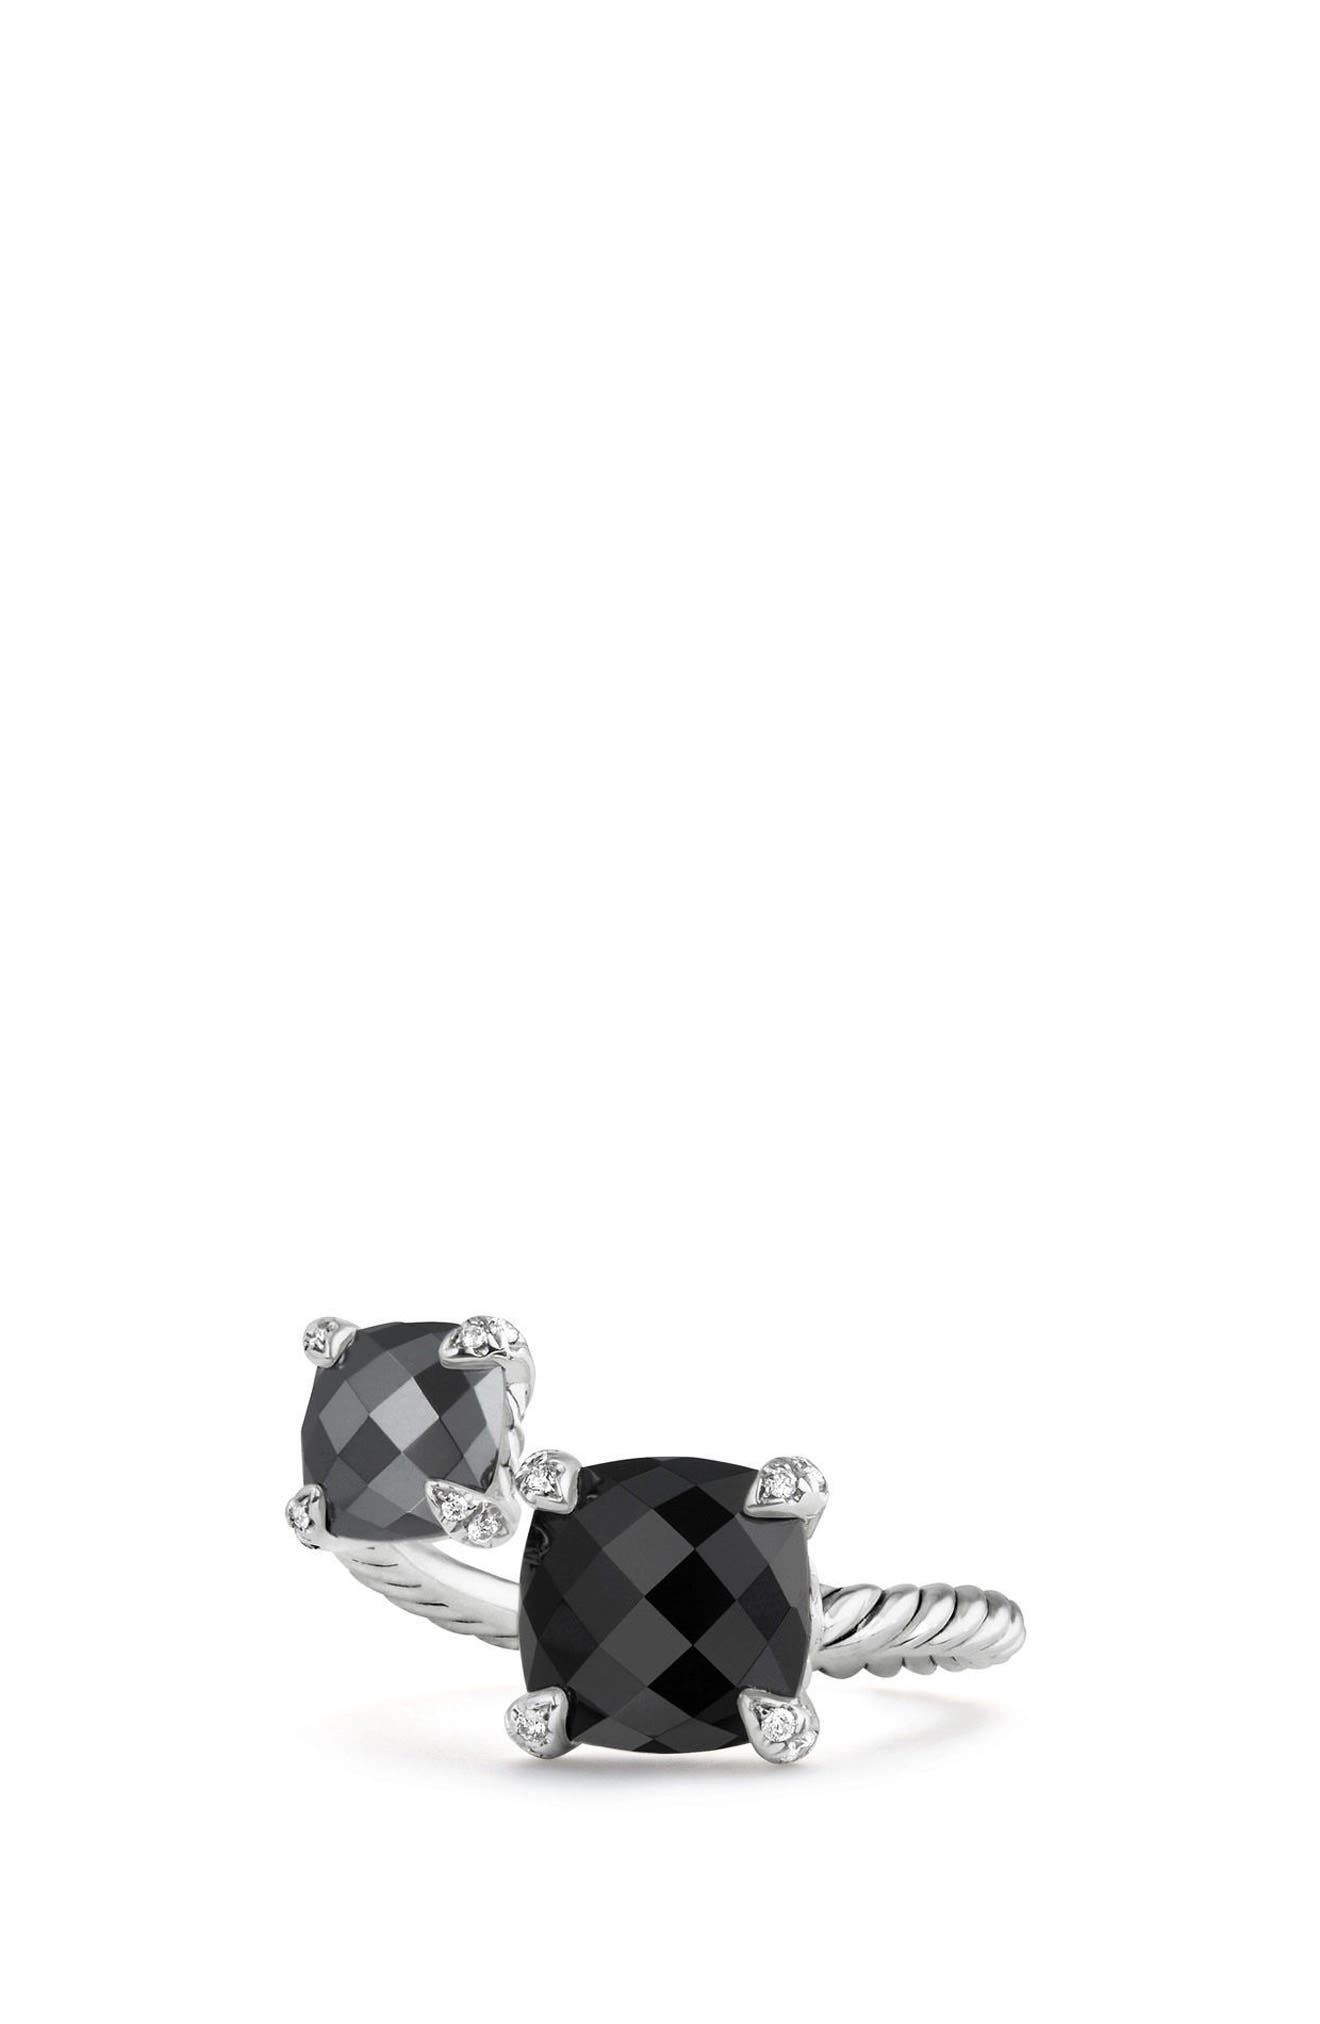 DAVID YURMAN Châtelaine Bypass Ring with Diamonds, Main, color, BLACK ONYX